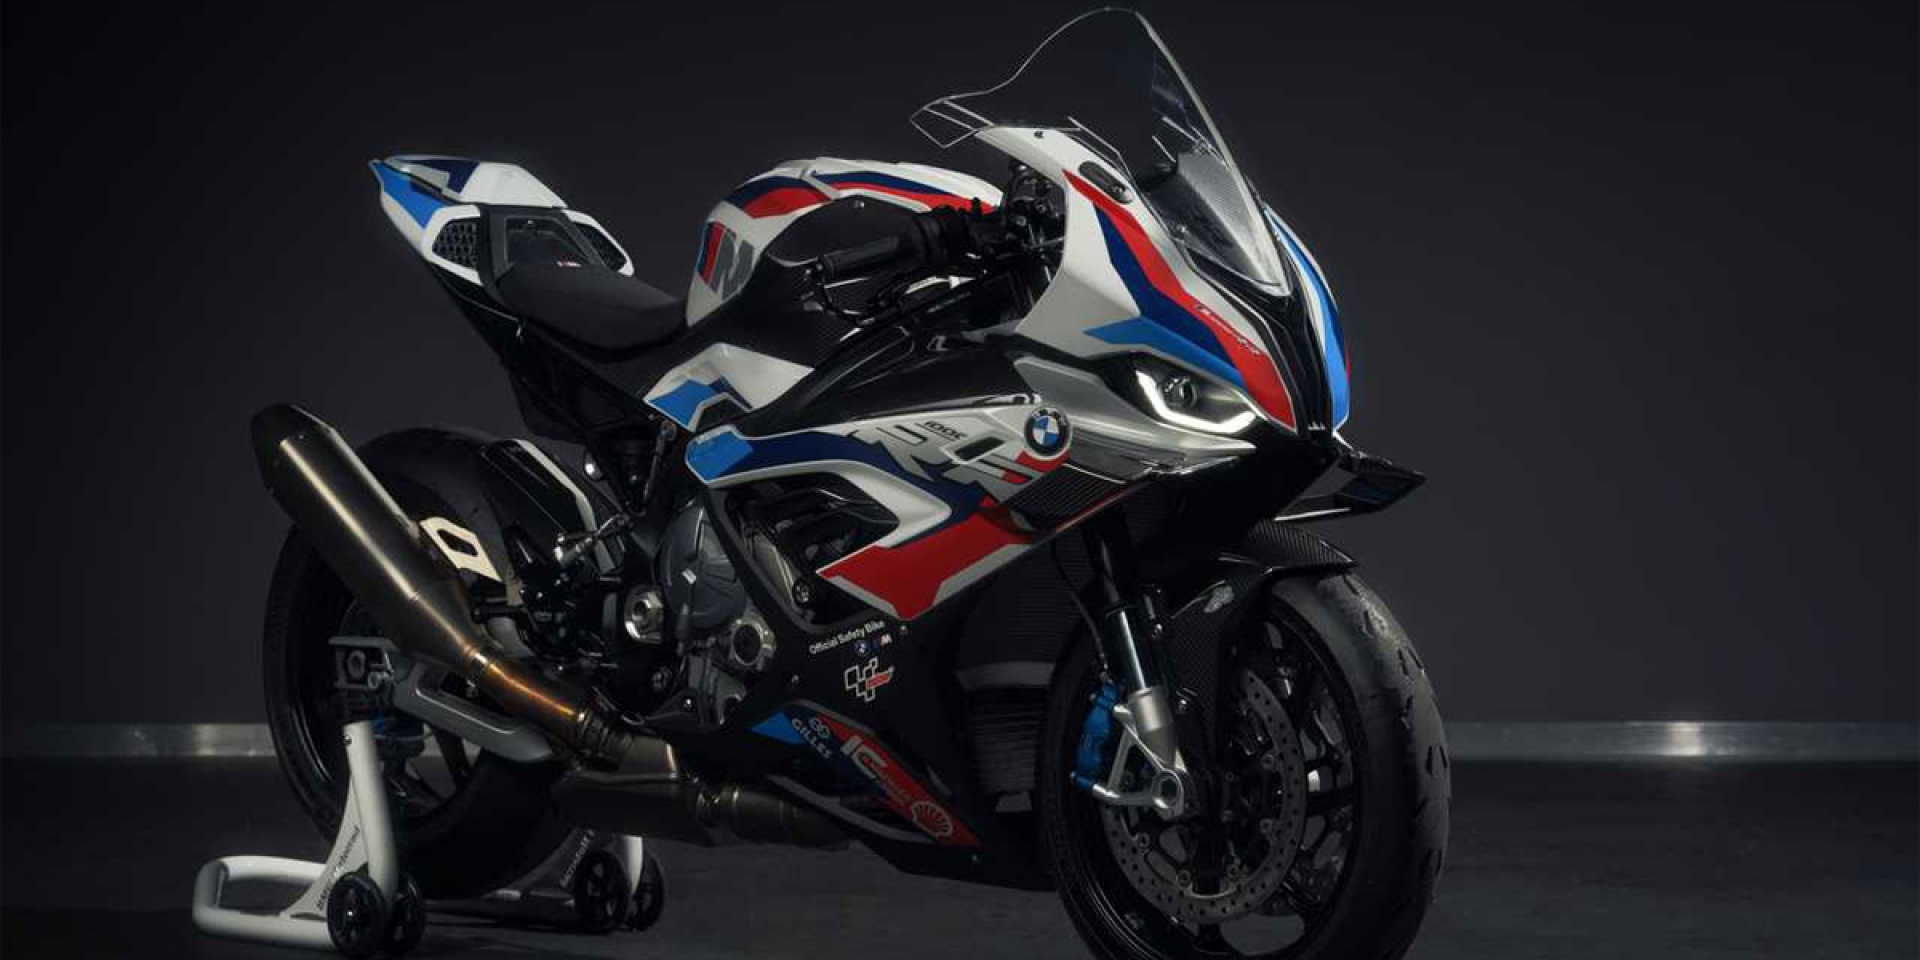 M 1000 RR跑MotoGP?BMW安全車隊加入新成員!